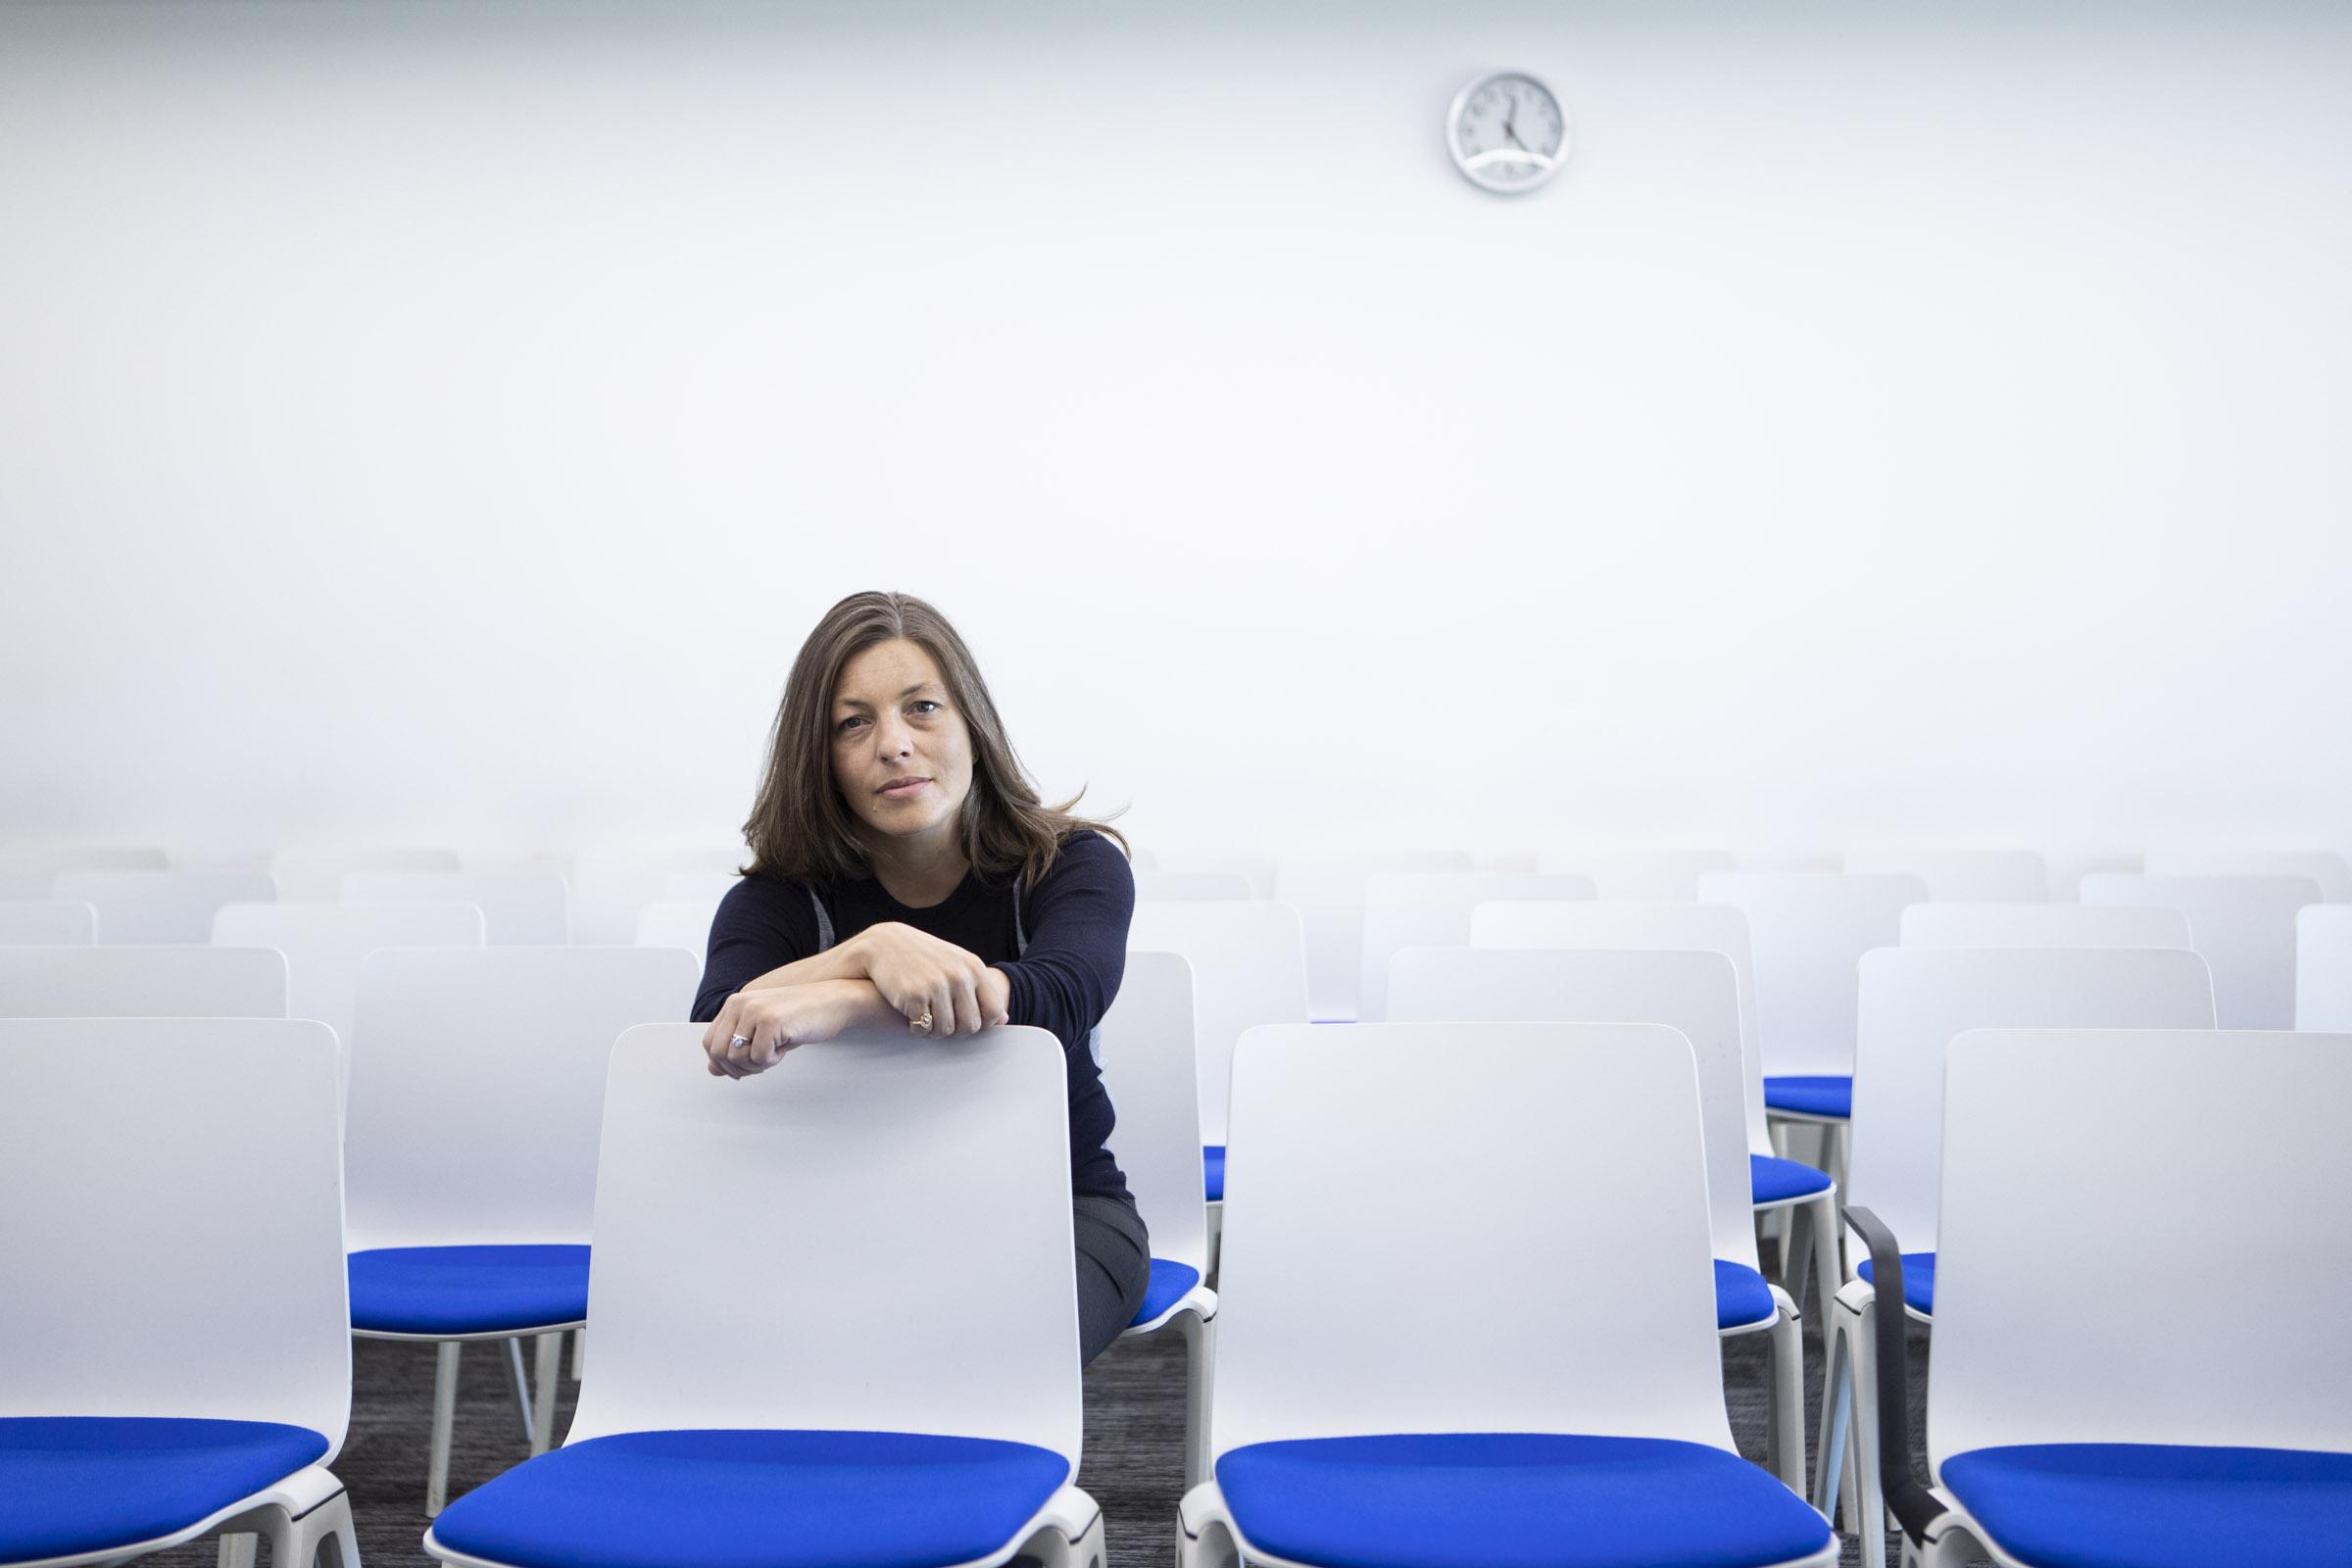 Dr. Gemma Chandratillake, Institute of Continuing Education